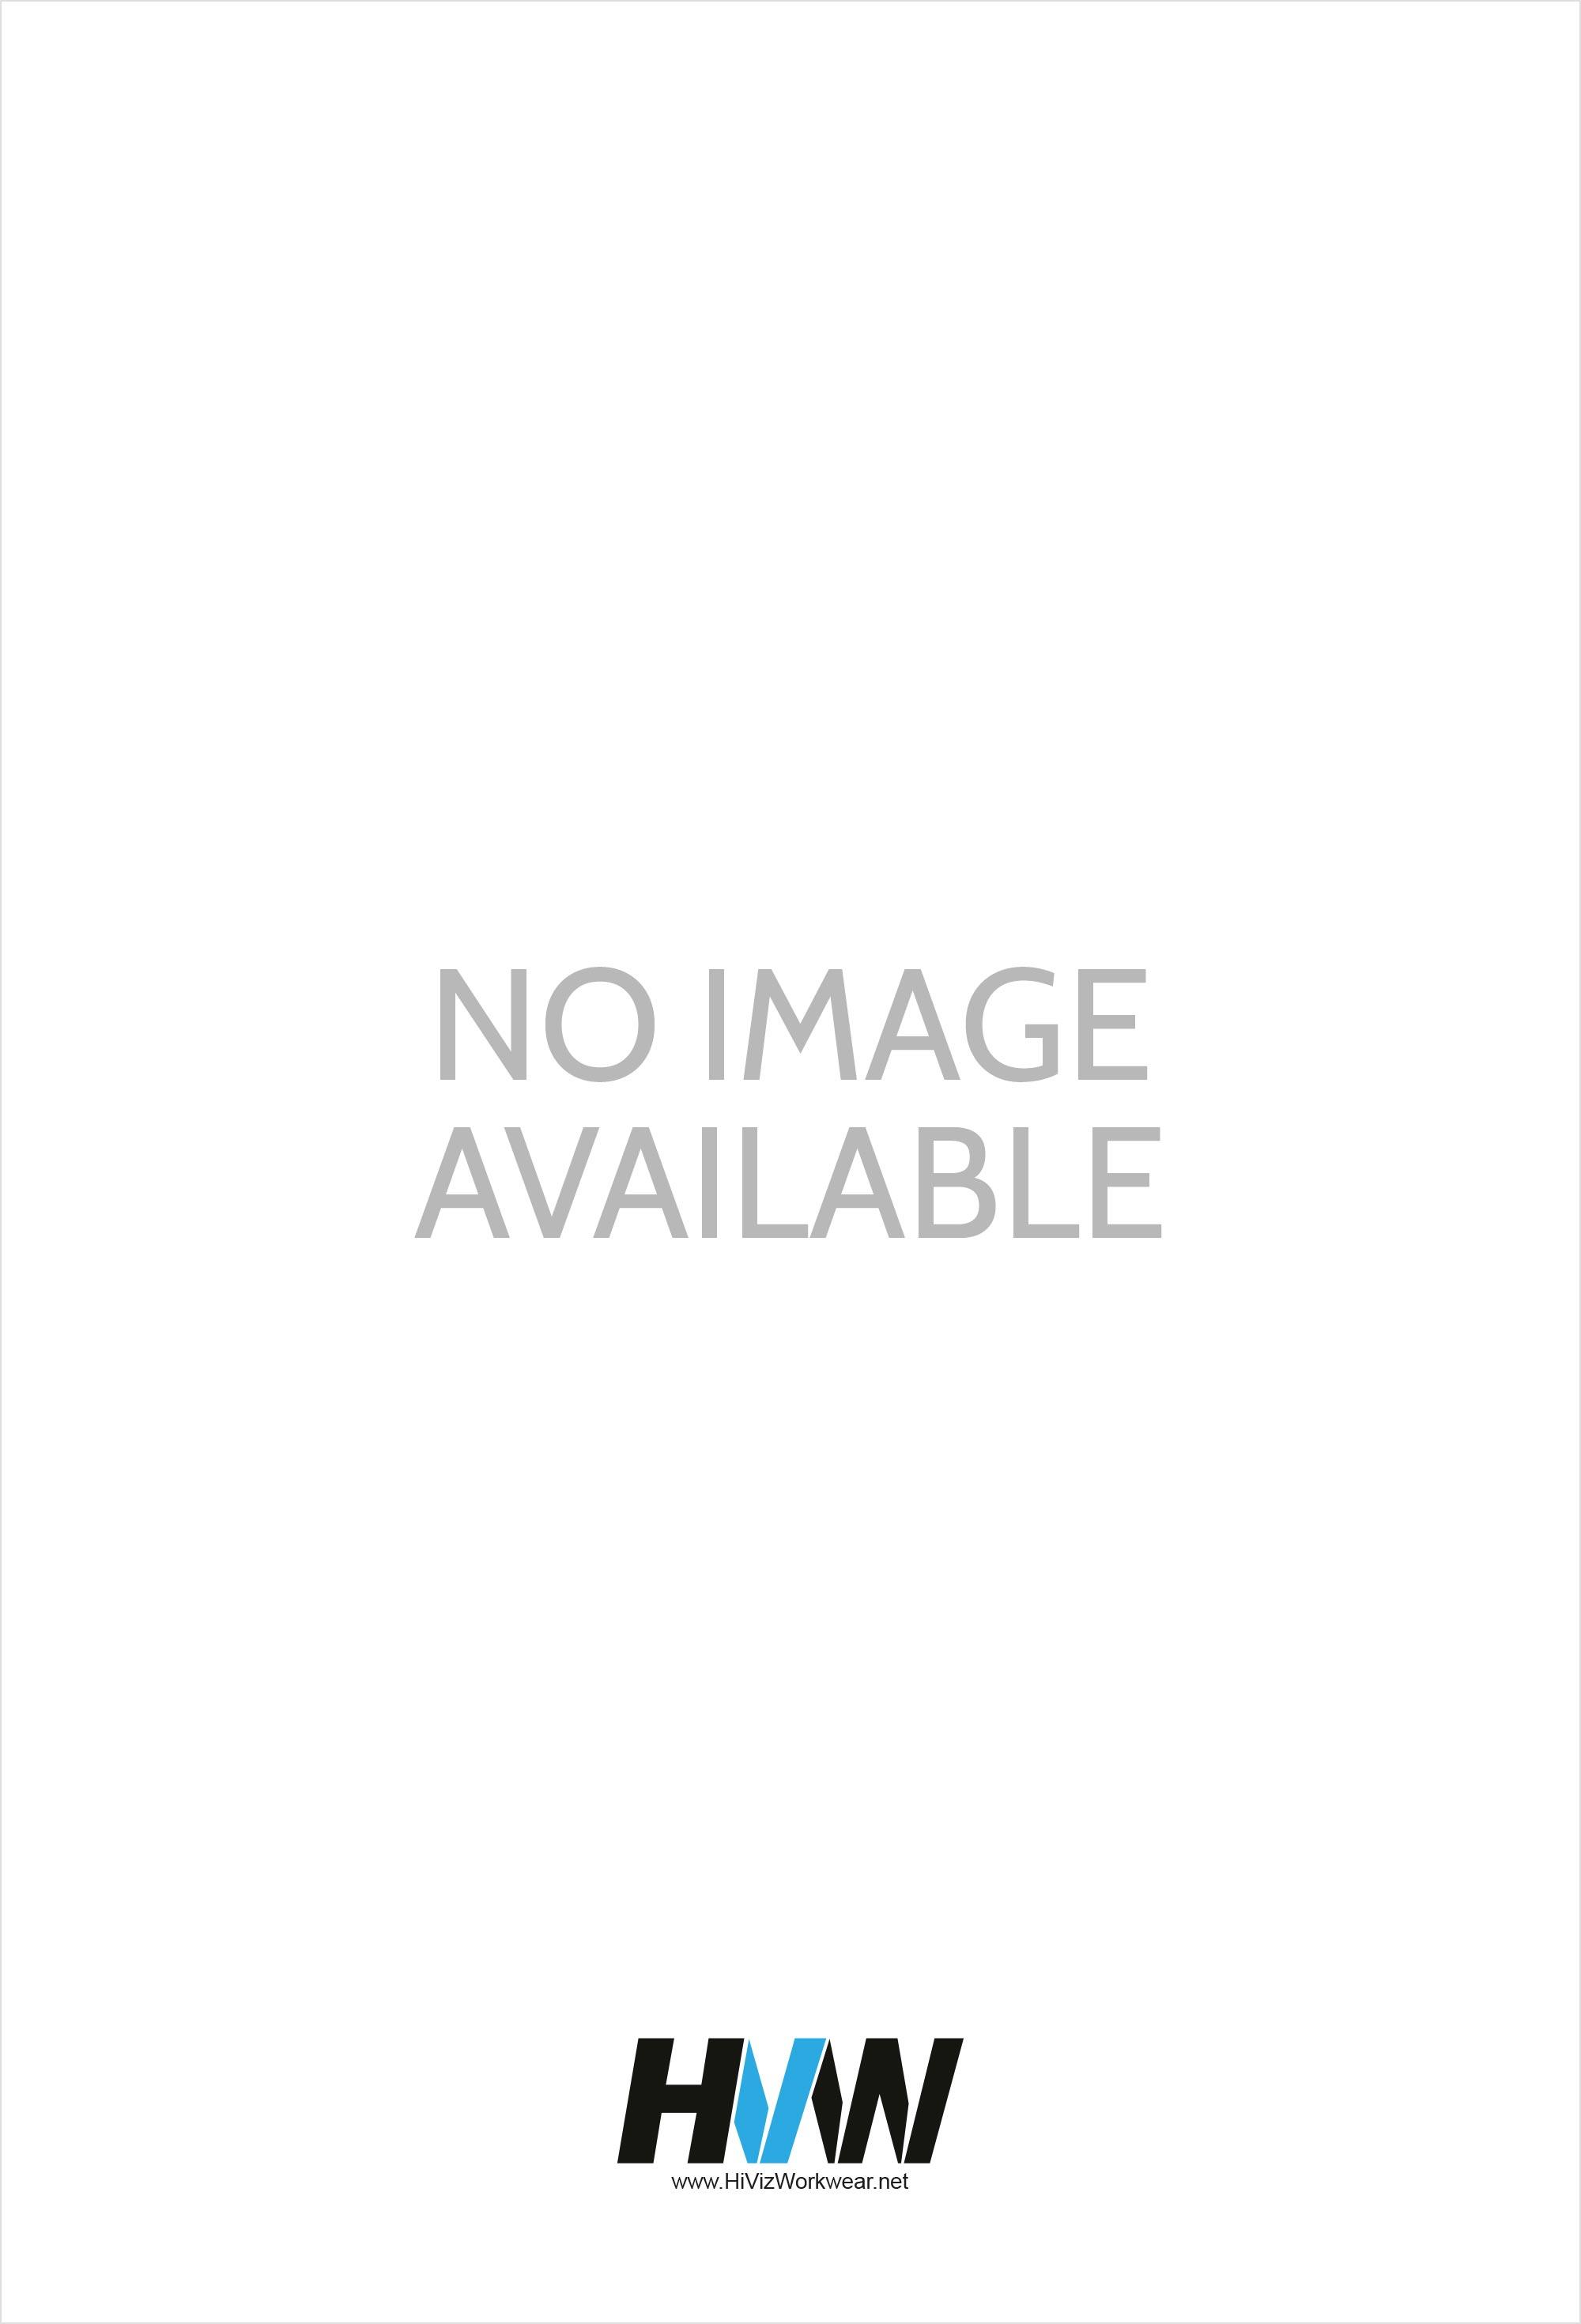 PR209 Supreme Poplin Short Sleeve Shirt  (Collar Size 14.5 To 19.0)